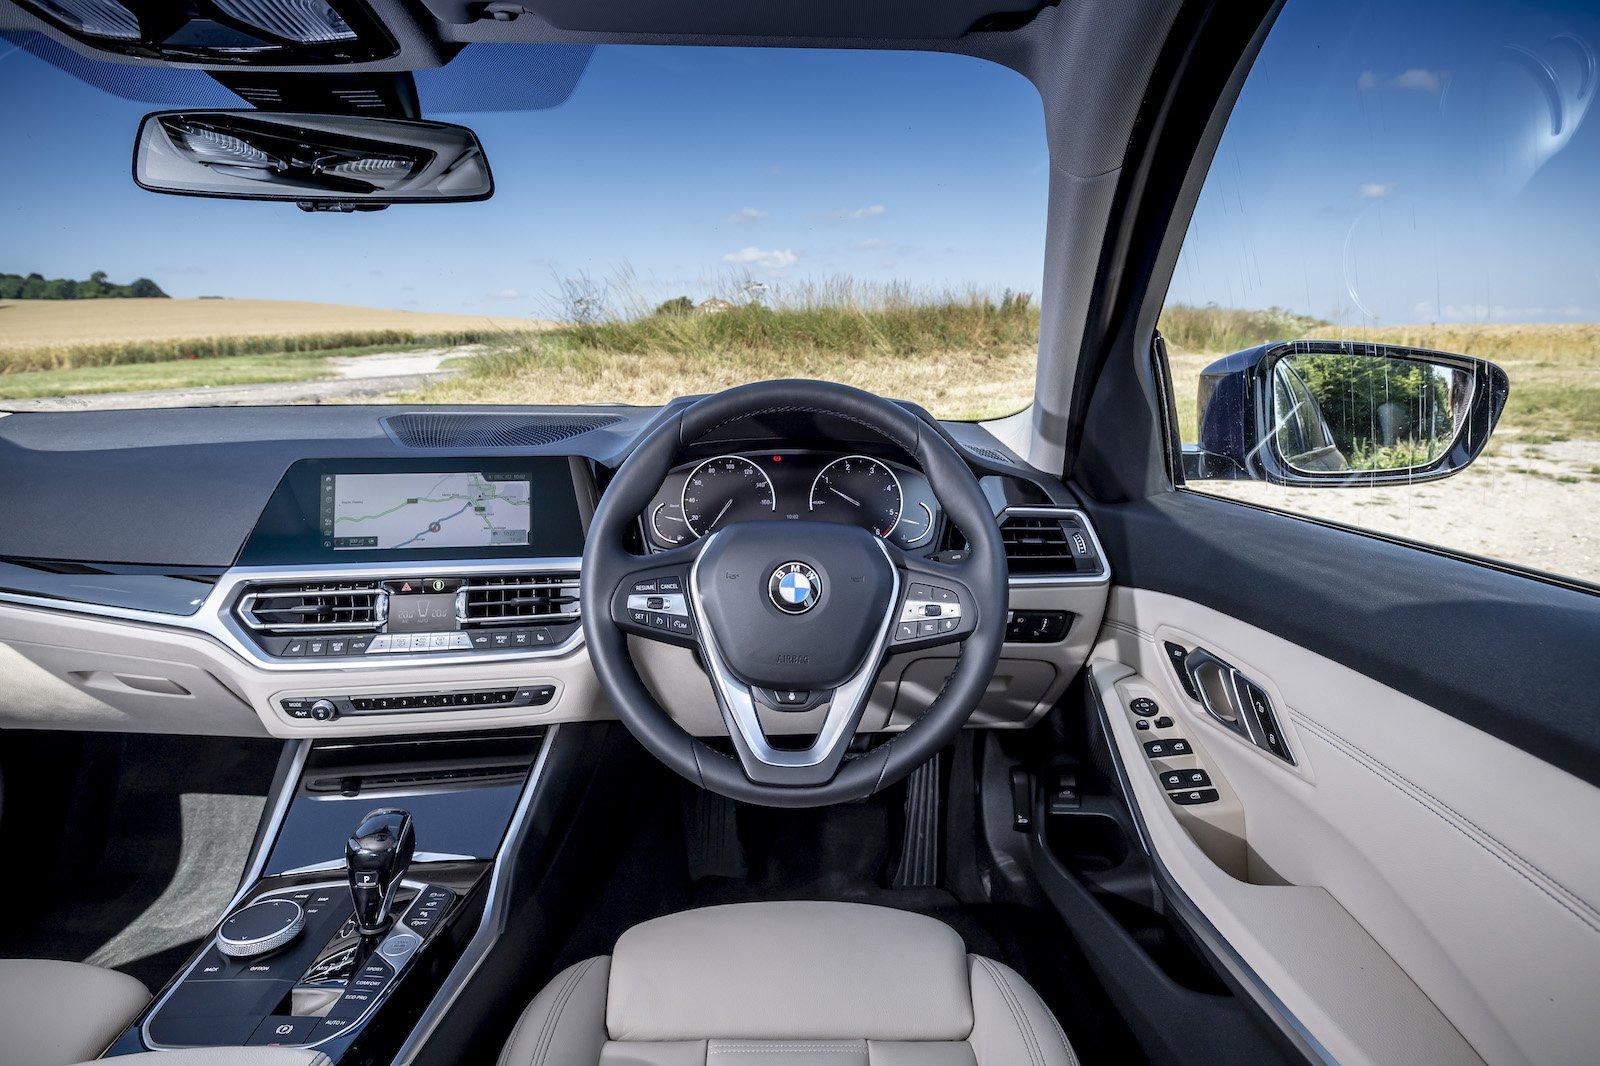 2019 bmw 3 series interior